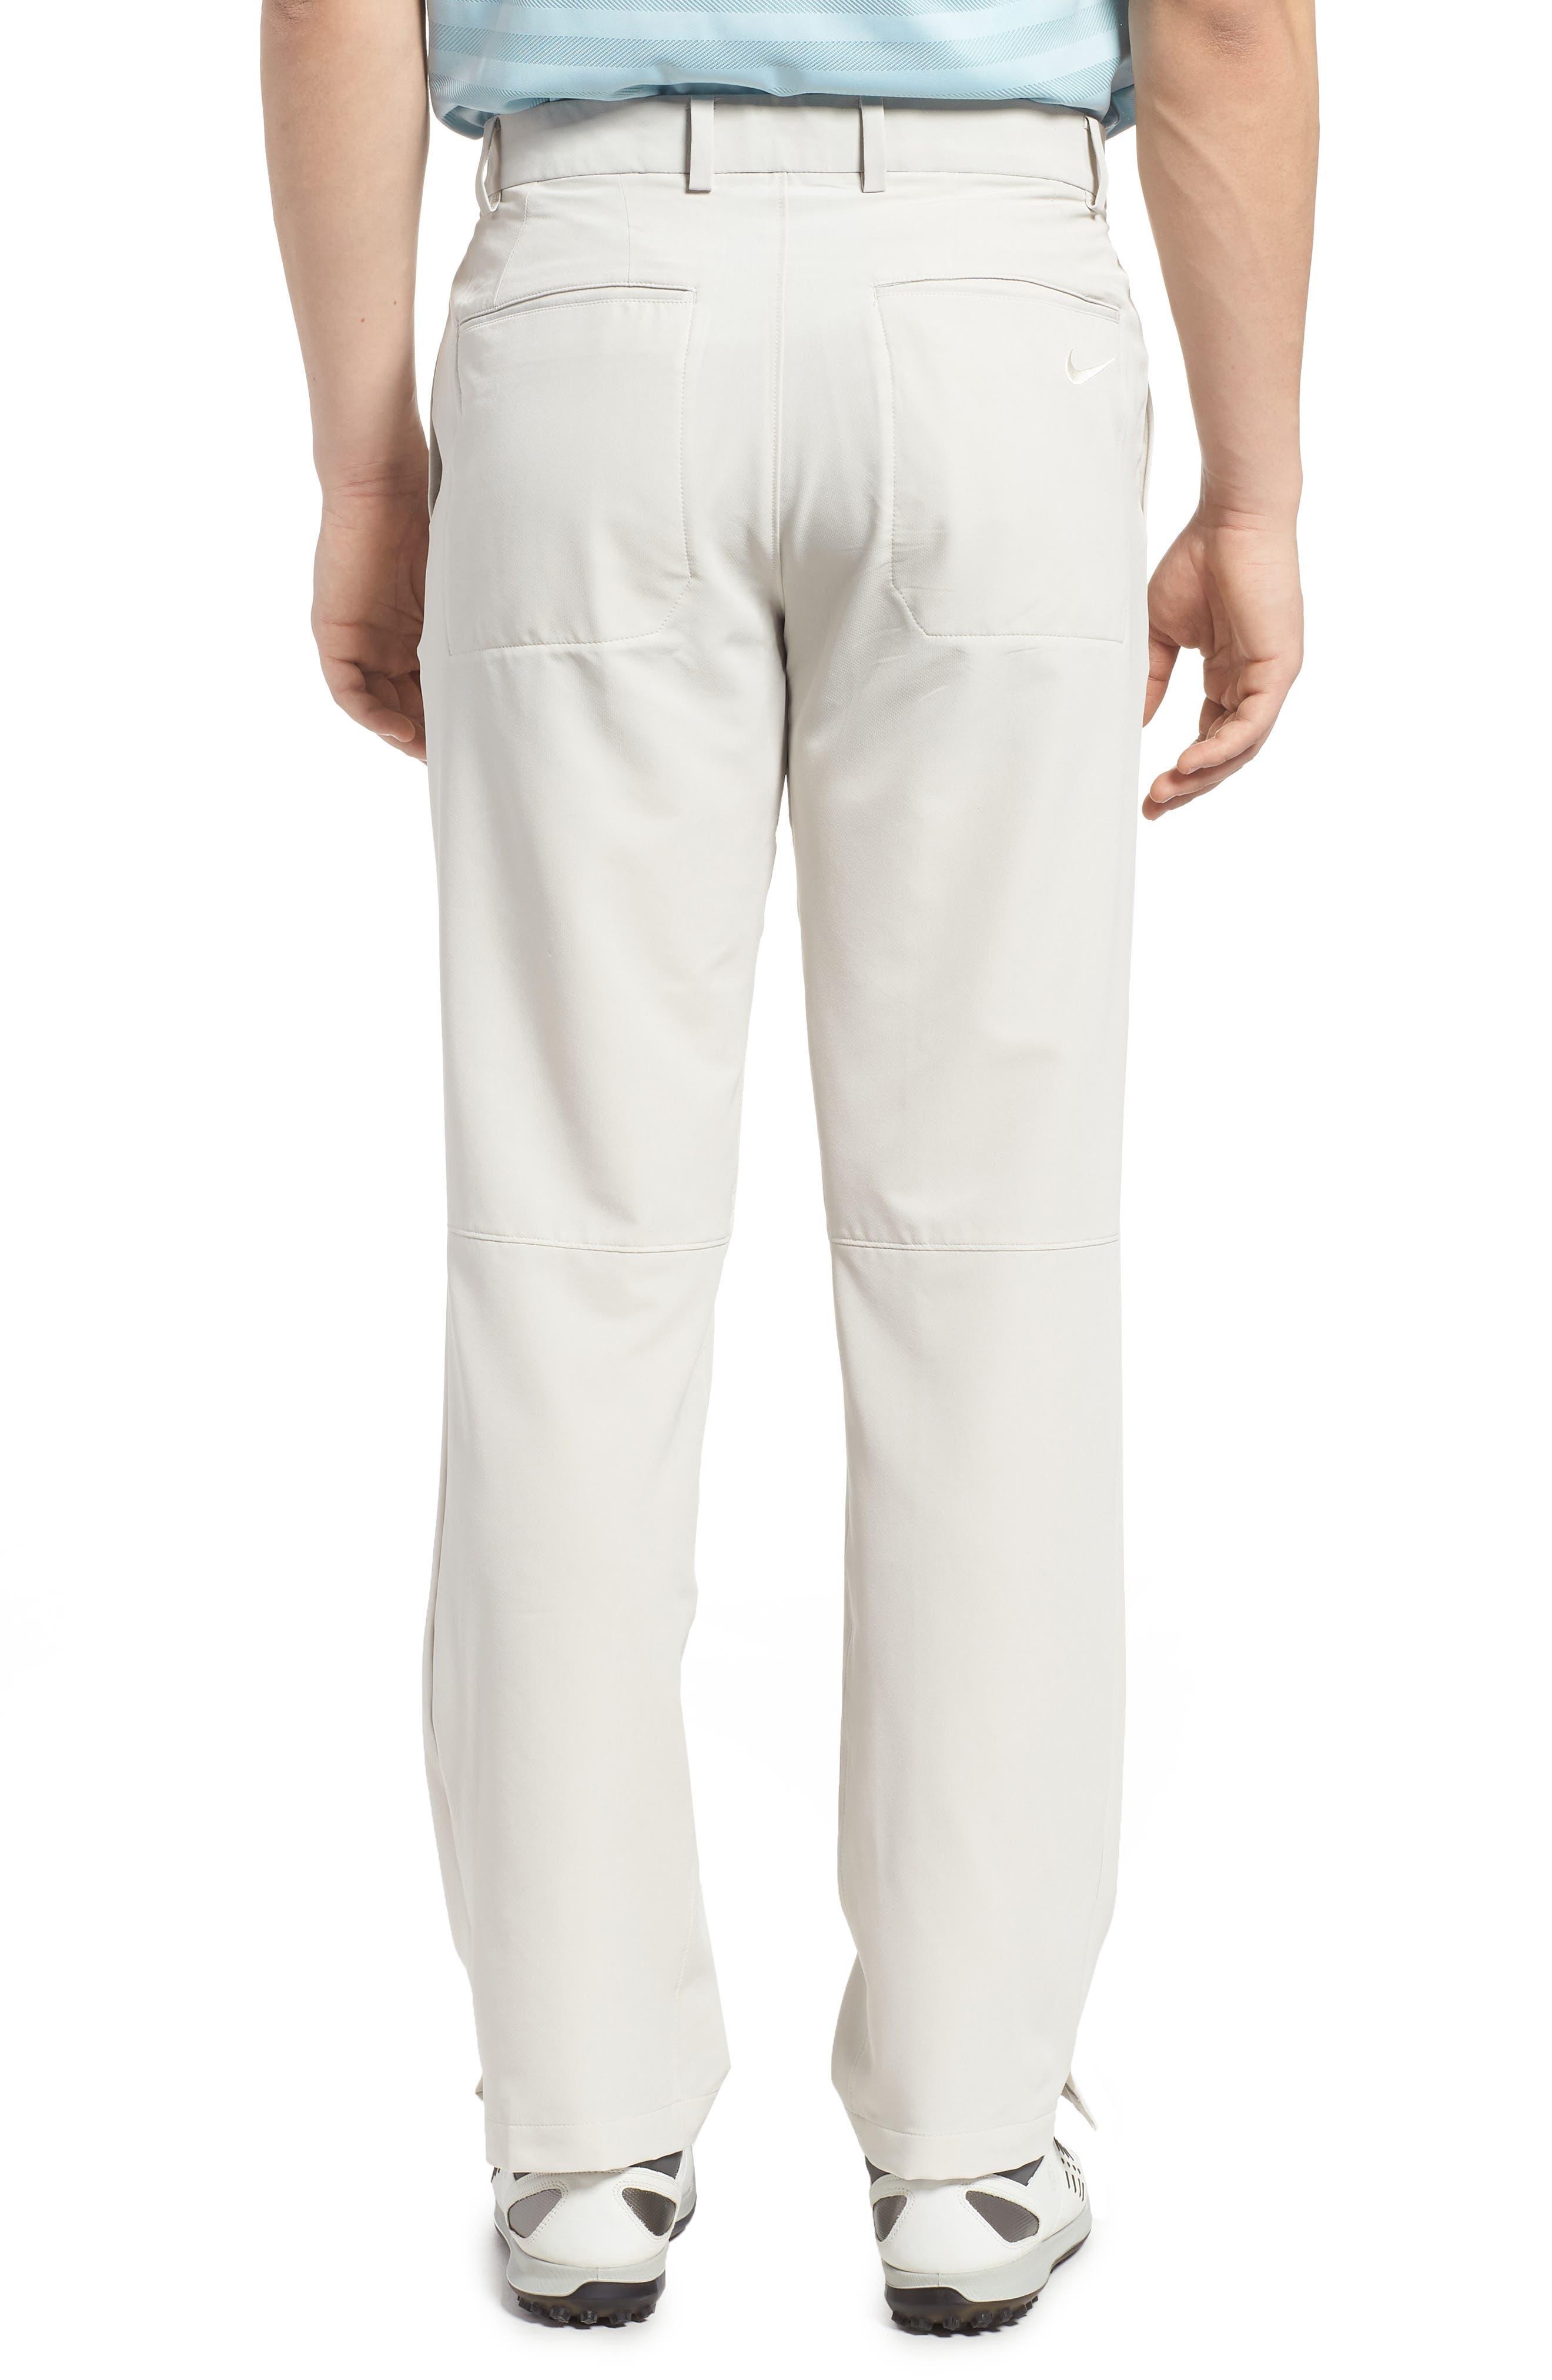 NIKE,                             Hybrid Flex Golf Pants,                             Alternate thumbnail 2, color,                             LIGHT BONE/ LIGHT BONE